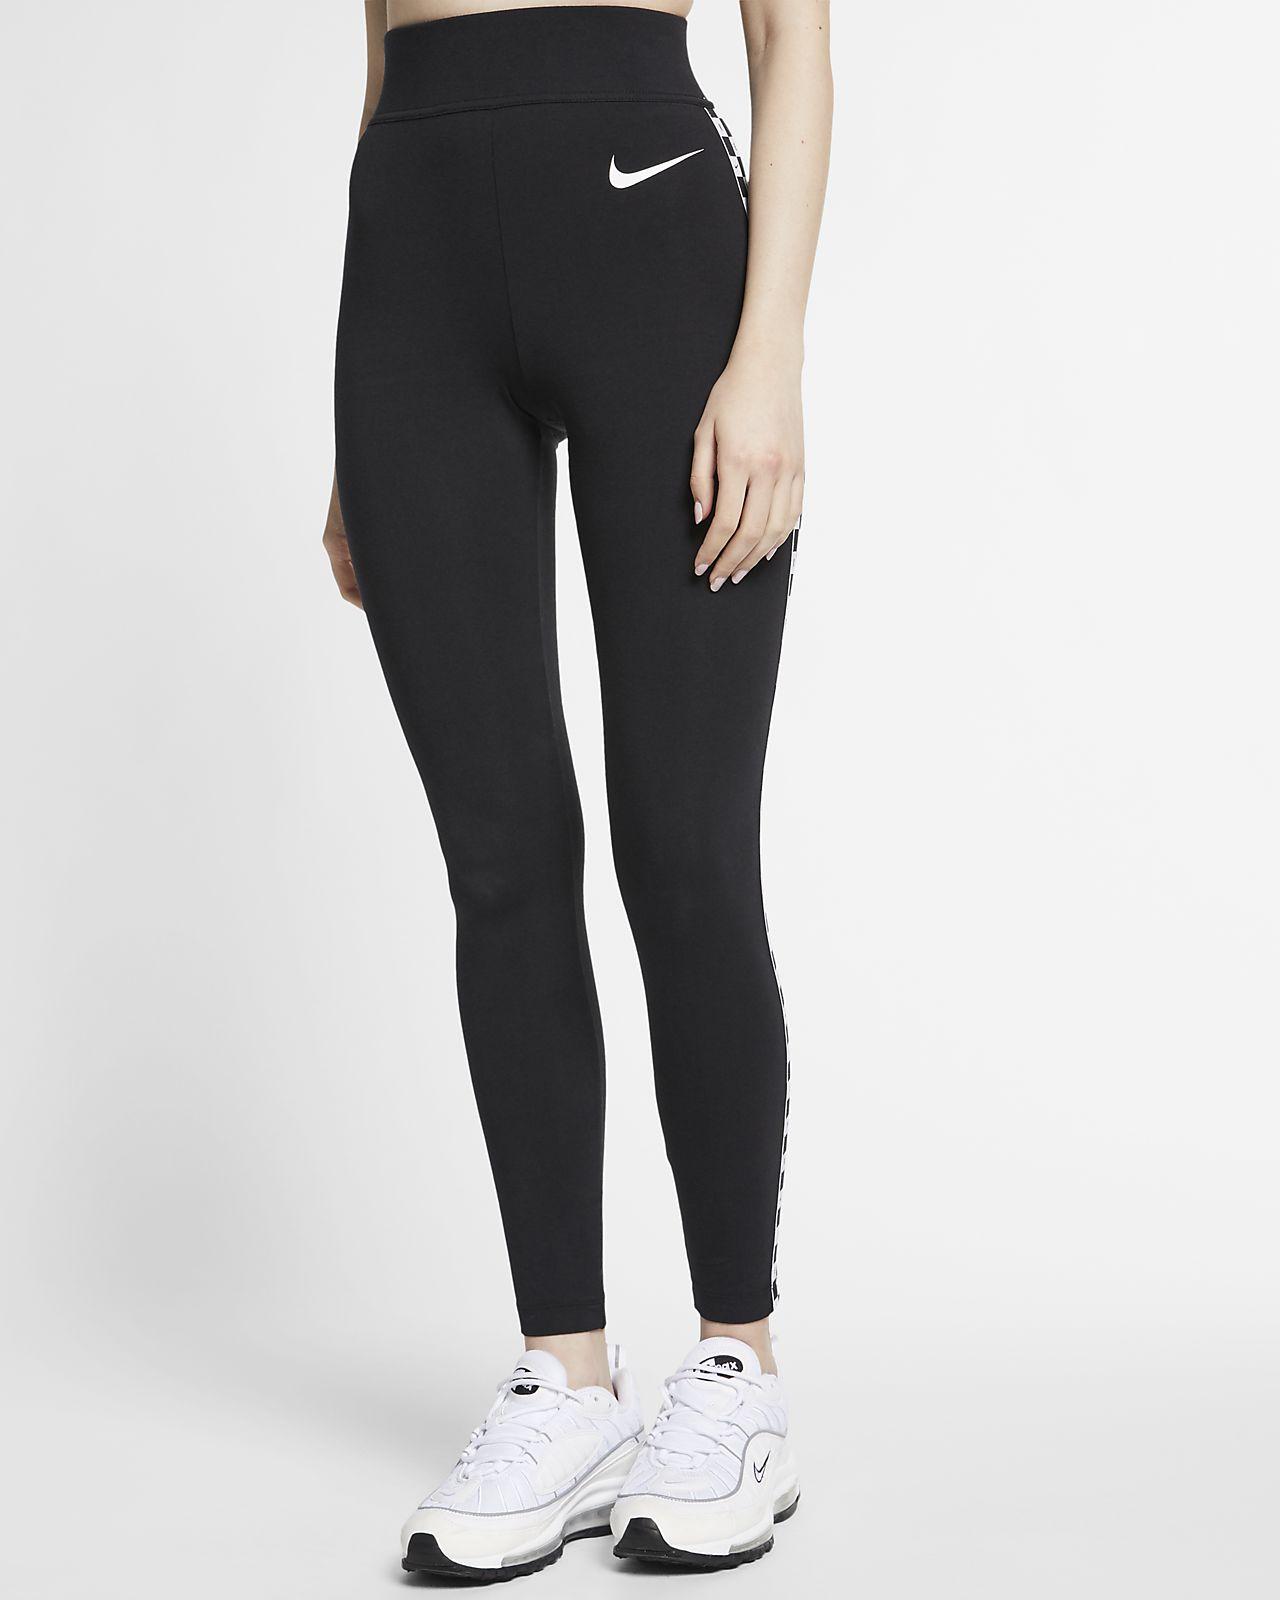 6a7d69bd805 Γυναικείο κολάν με σχέδια Nike Sportswear